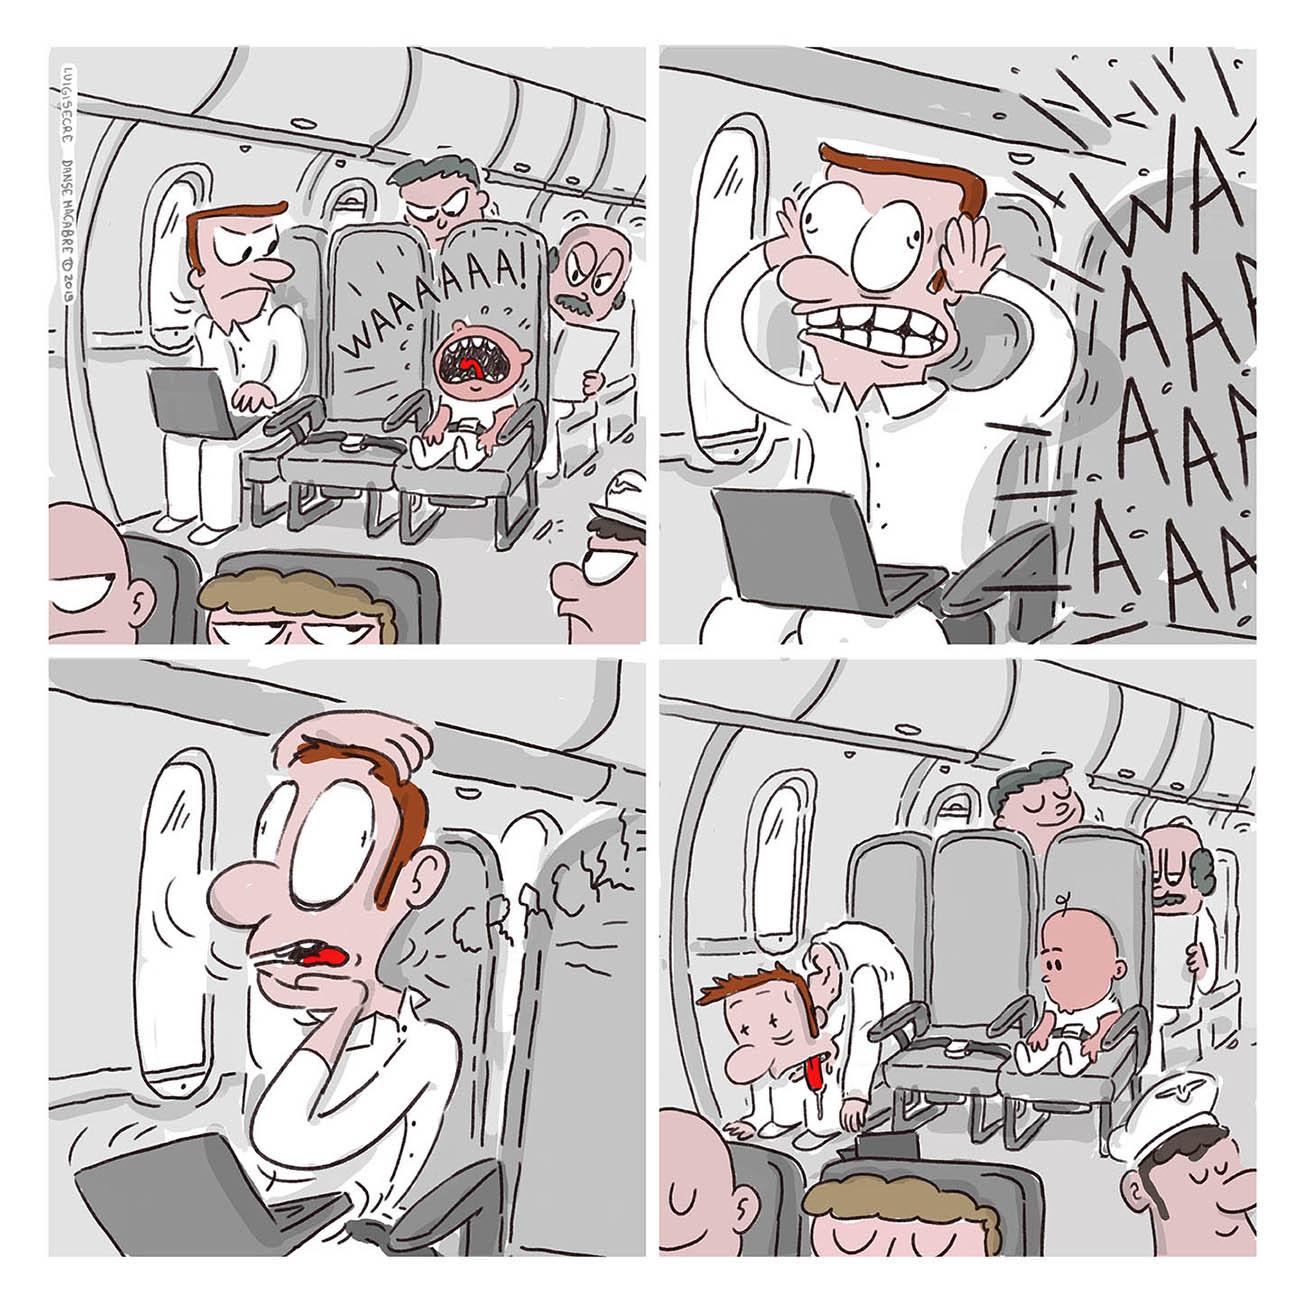 Contenuti_Low_Res_Luigi_Segre_Cartoons_2019_Danse_Macabre_04.jpg